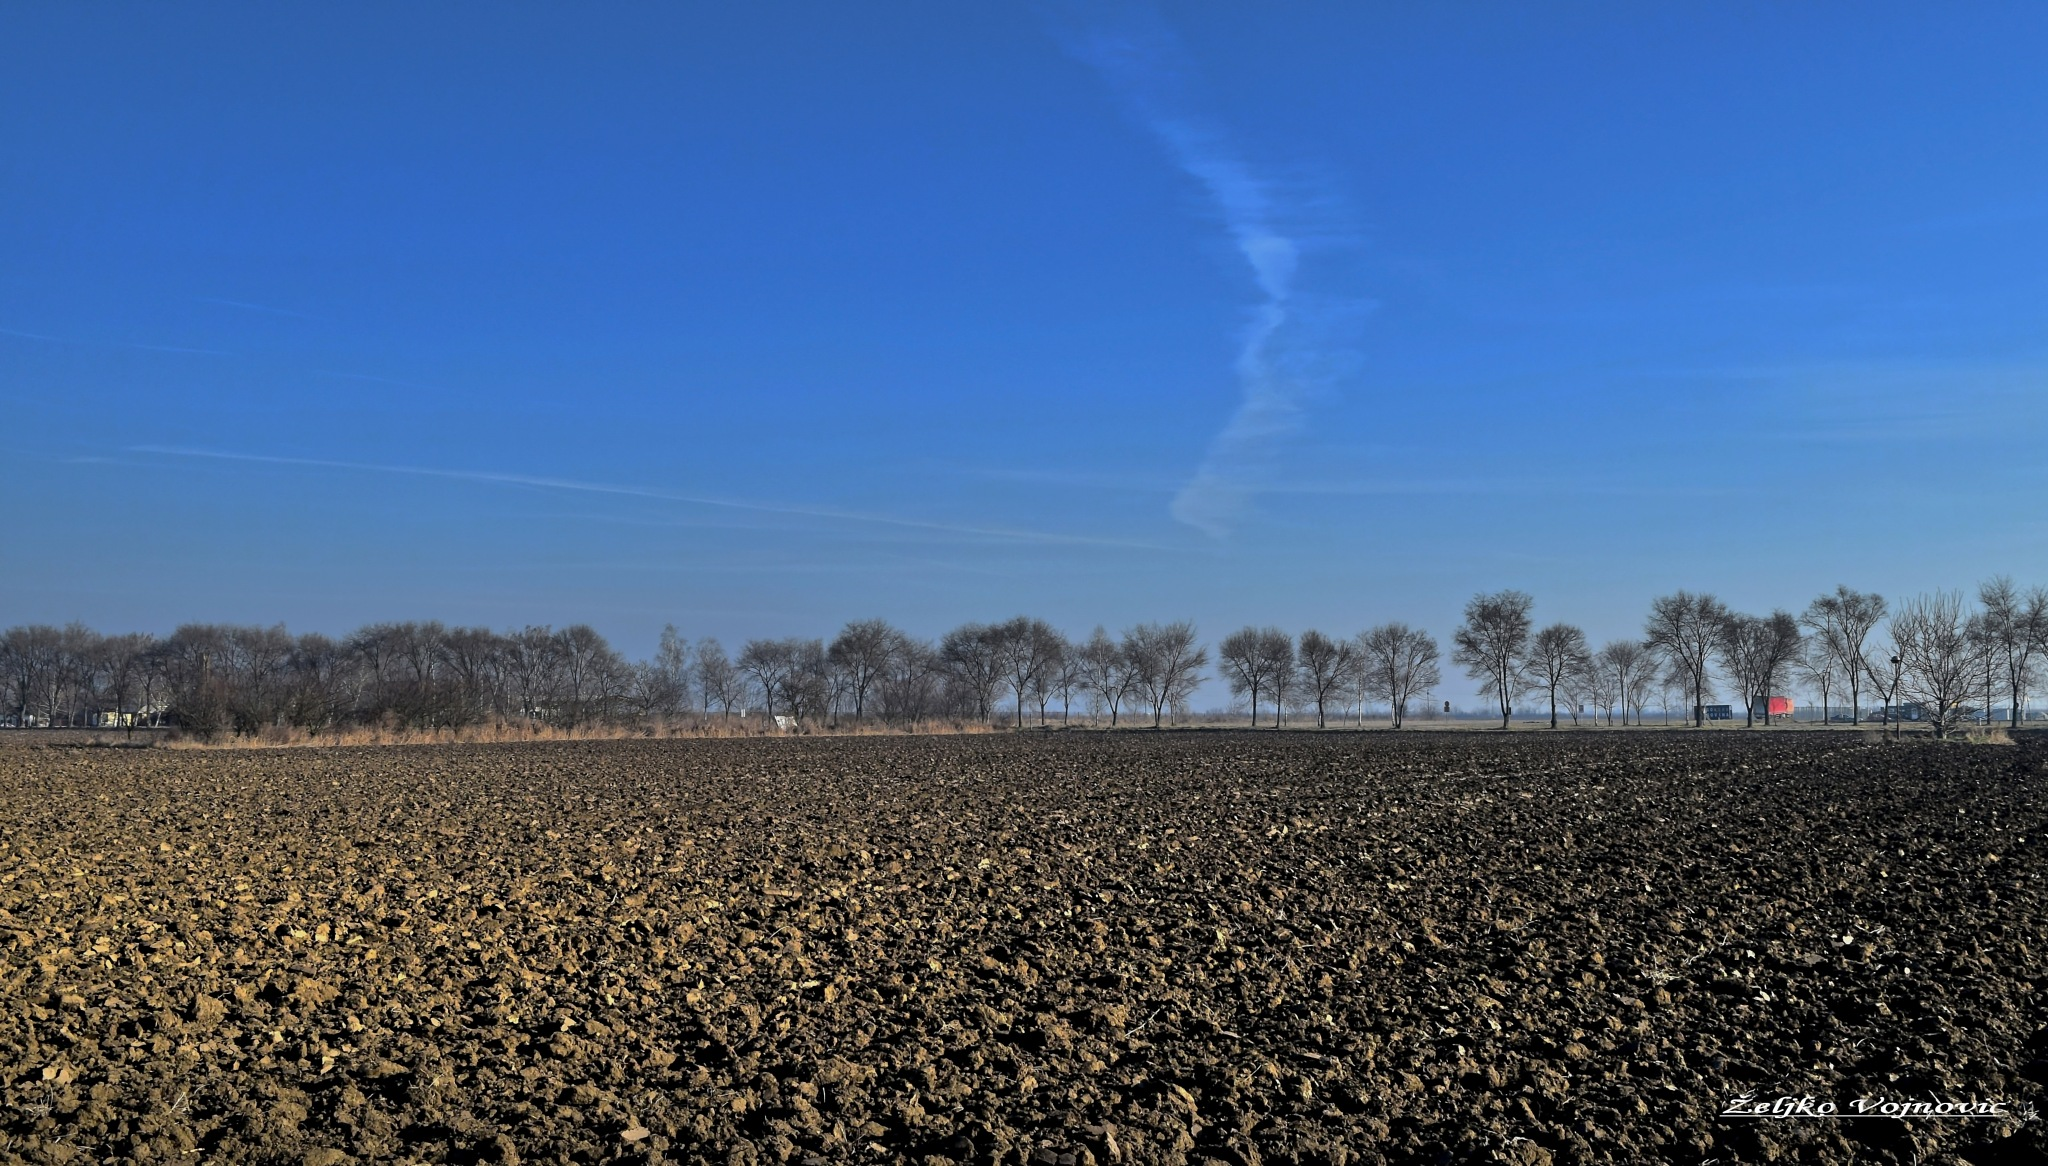 Odžaci, Vojvodina plains, Serbia  by Željko Vojnović